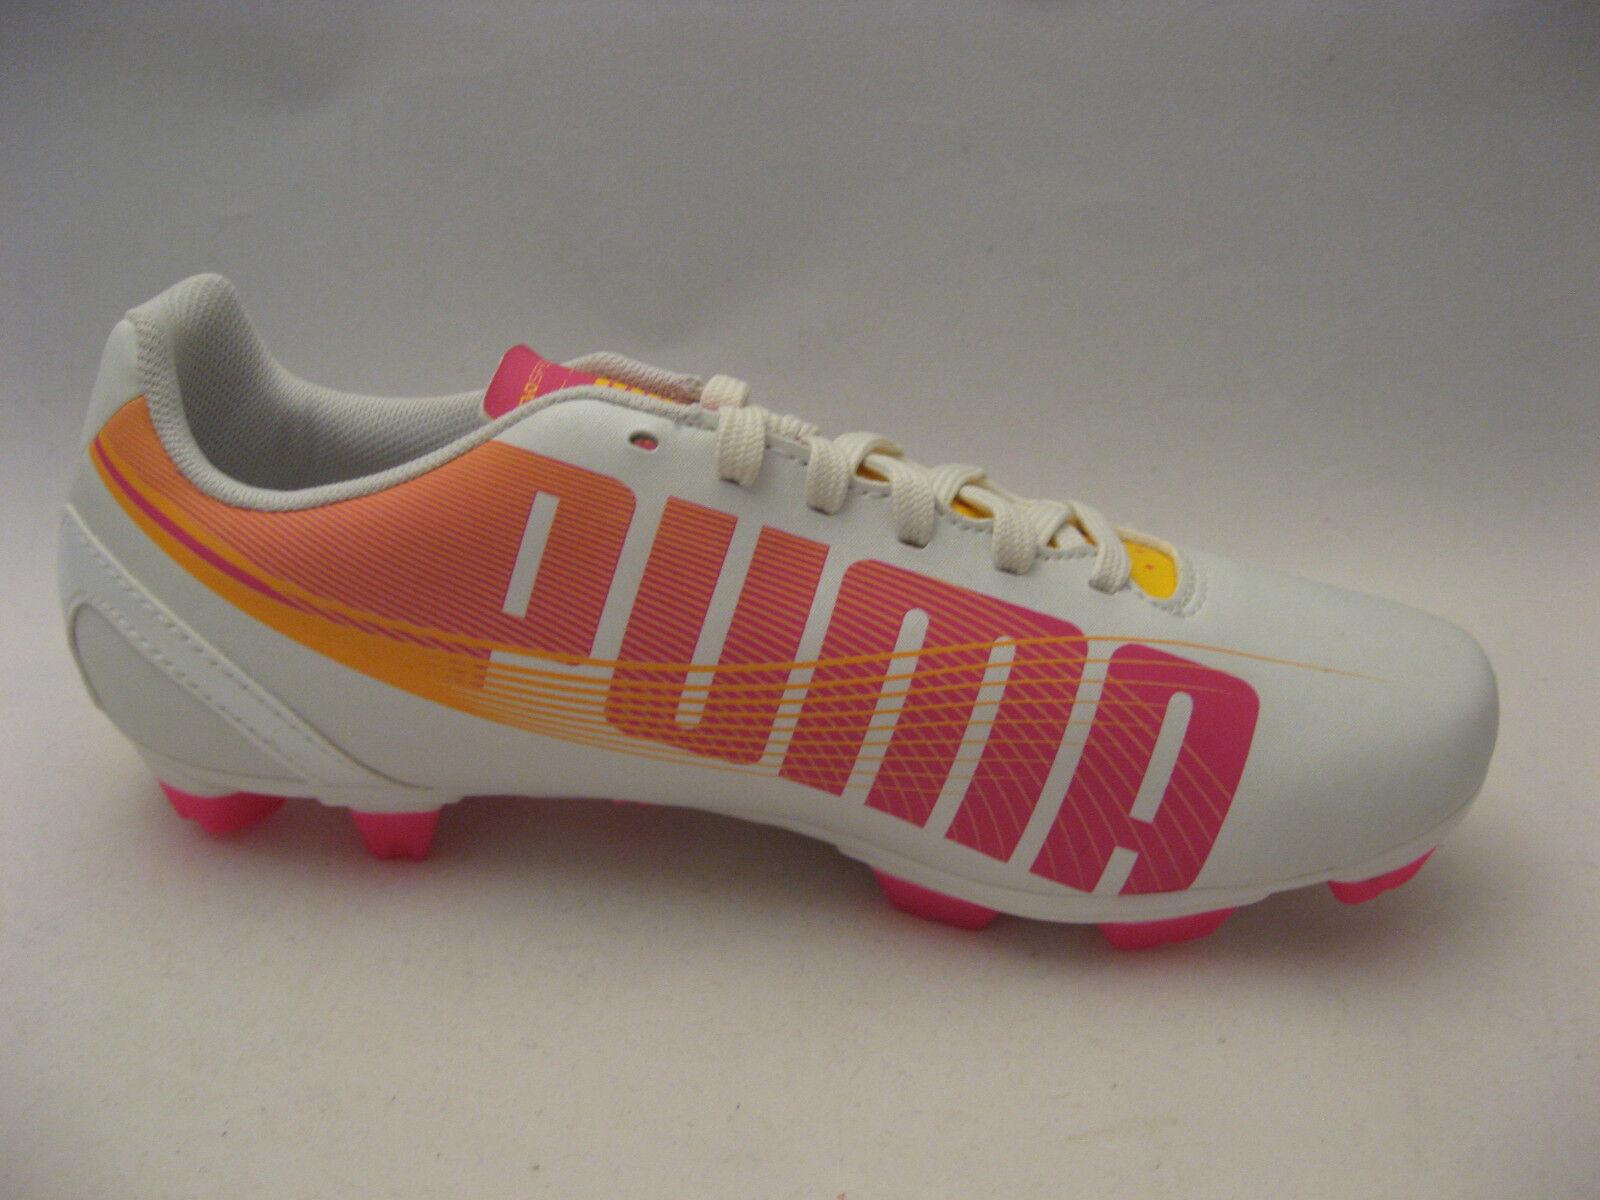 PUMA Women evoSPEED 10 5.2 FG Soccer Cleats 10 evoSPEED Medium Pearlized White Pink Orange a3be79